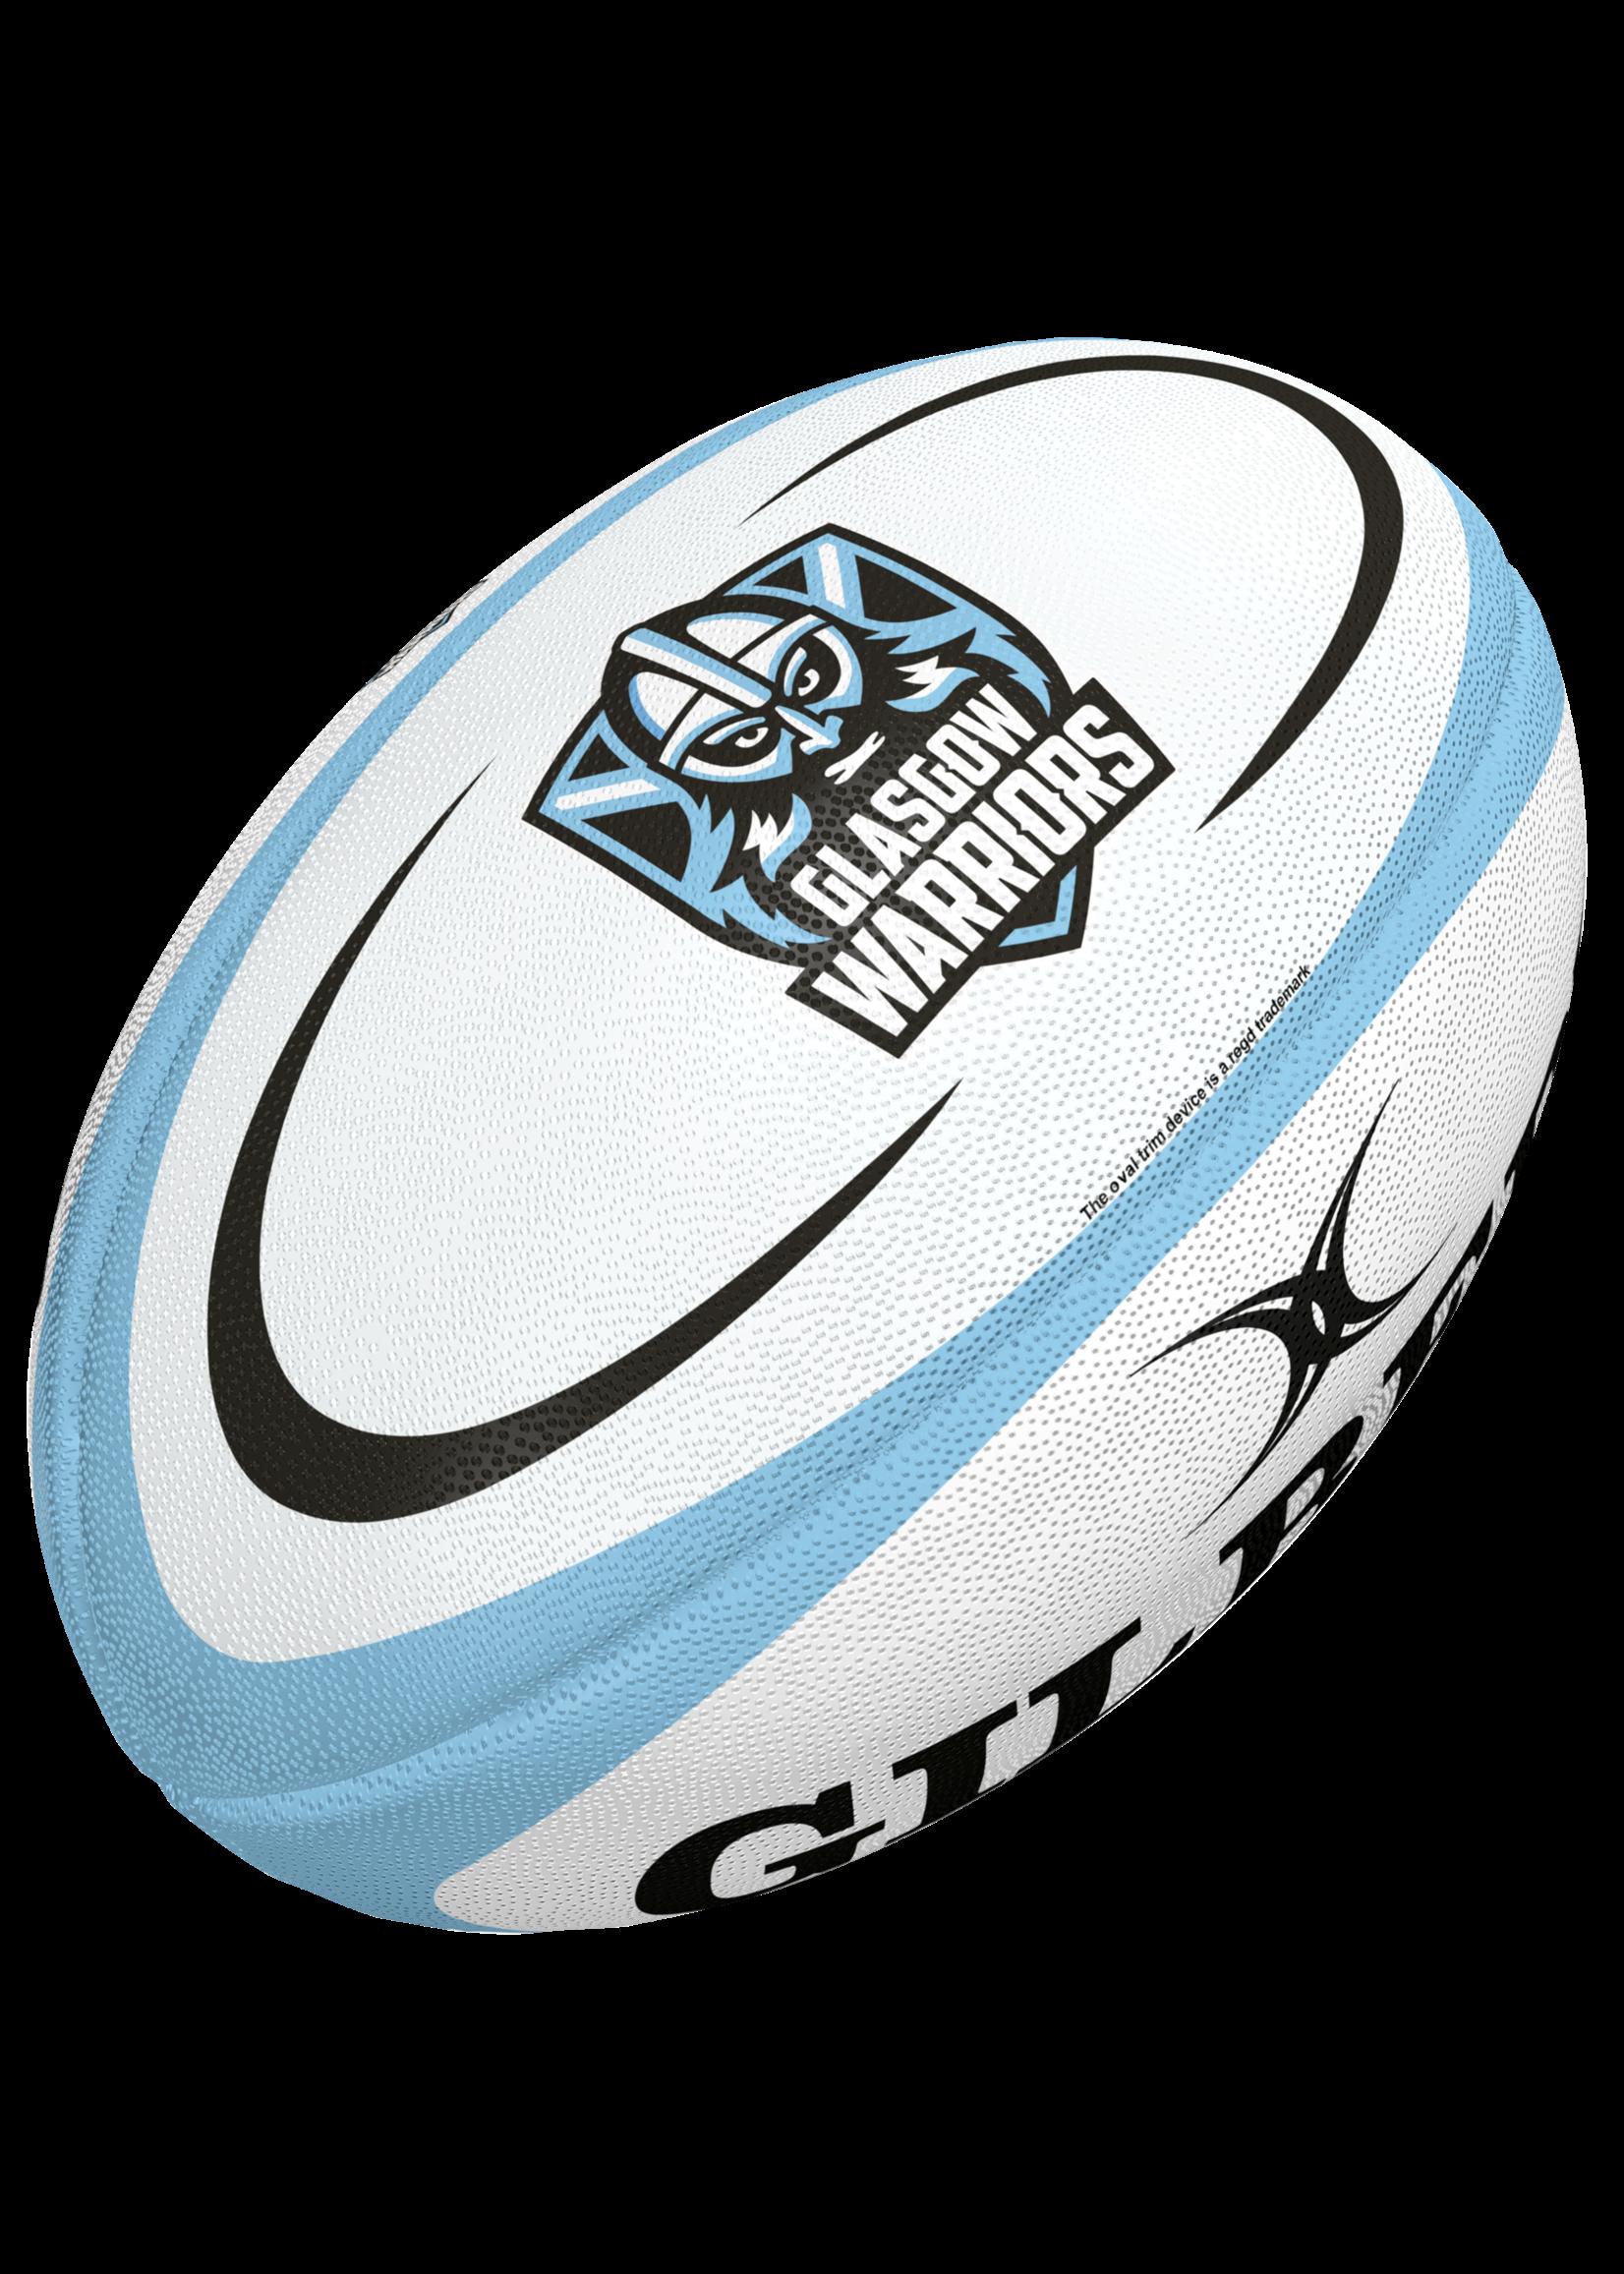 Gilbert Glasgow Mini Replica Rugby Ball (2021)